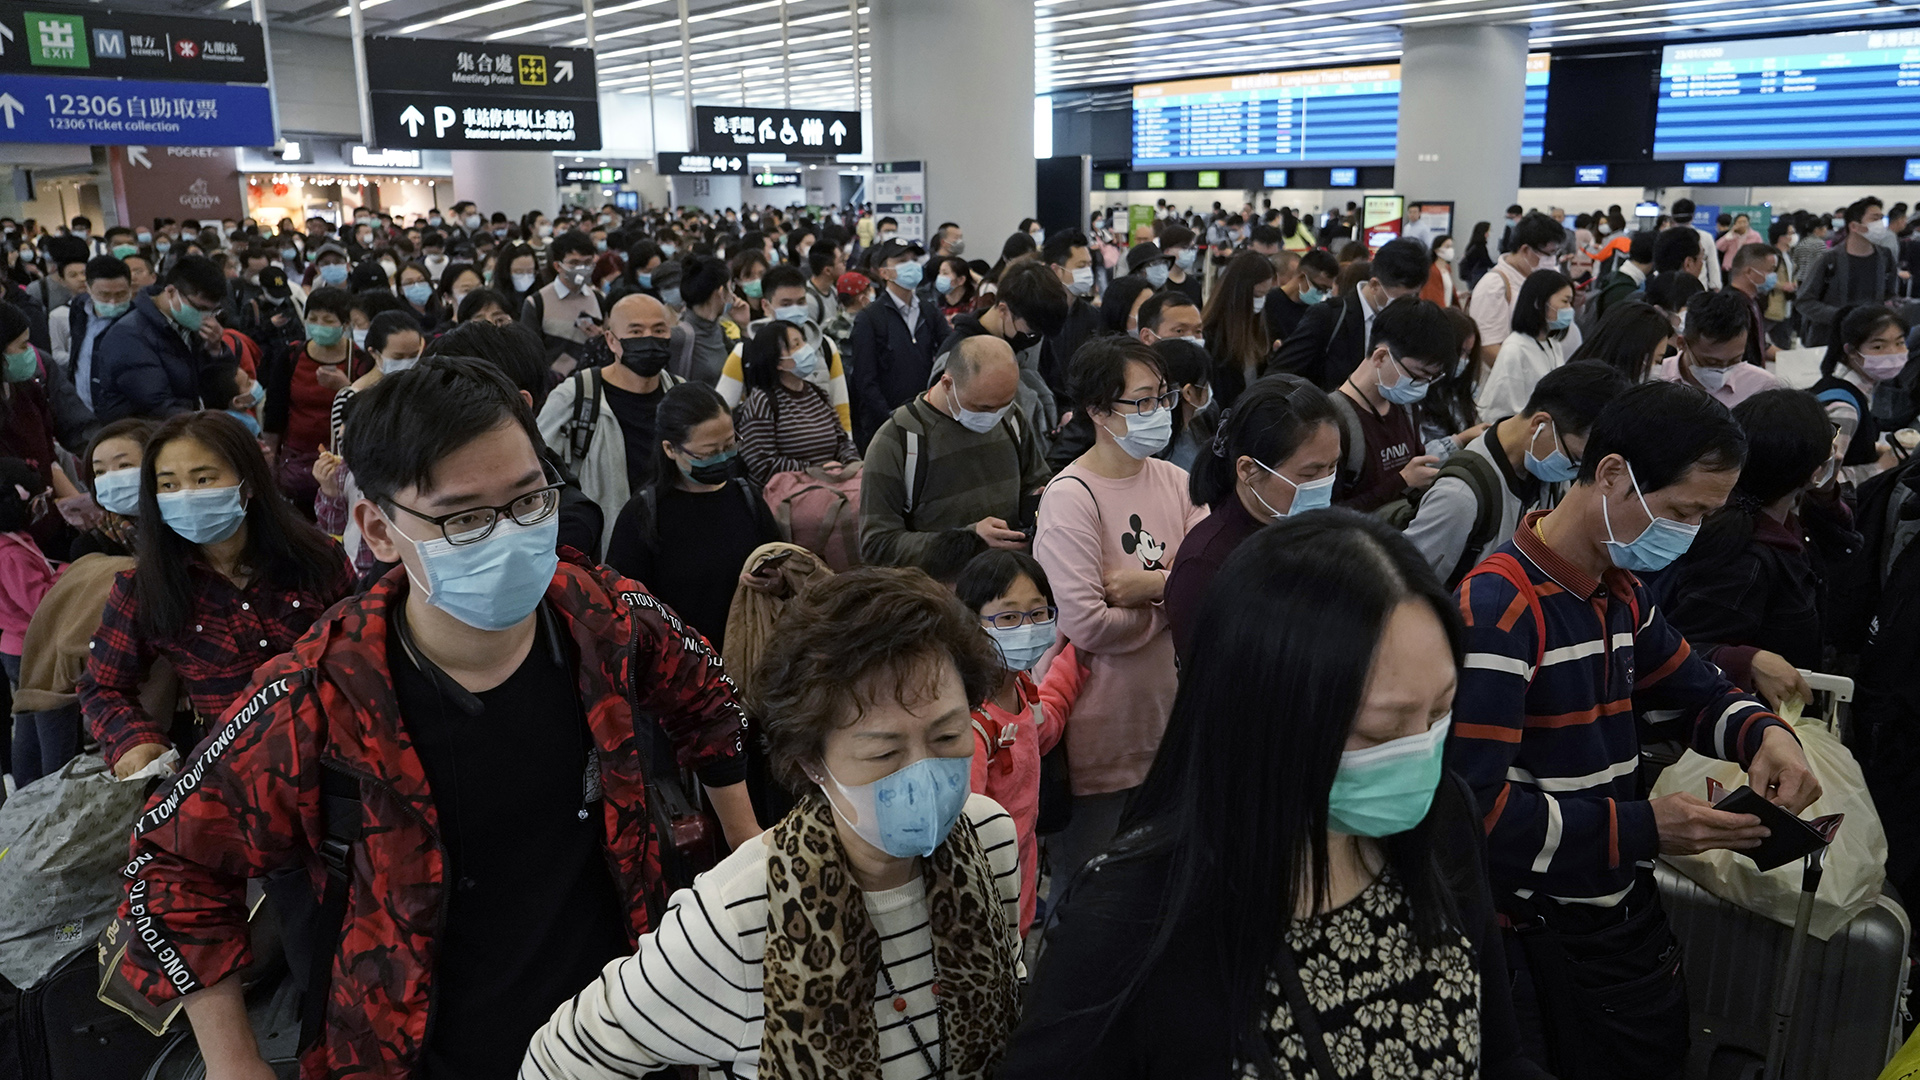 Extranjeros intentan salir de China por el coronavirus